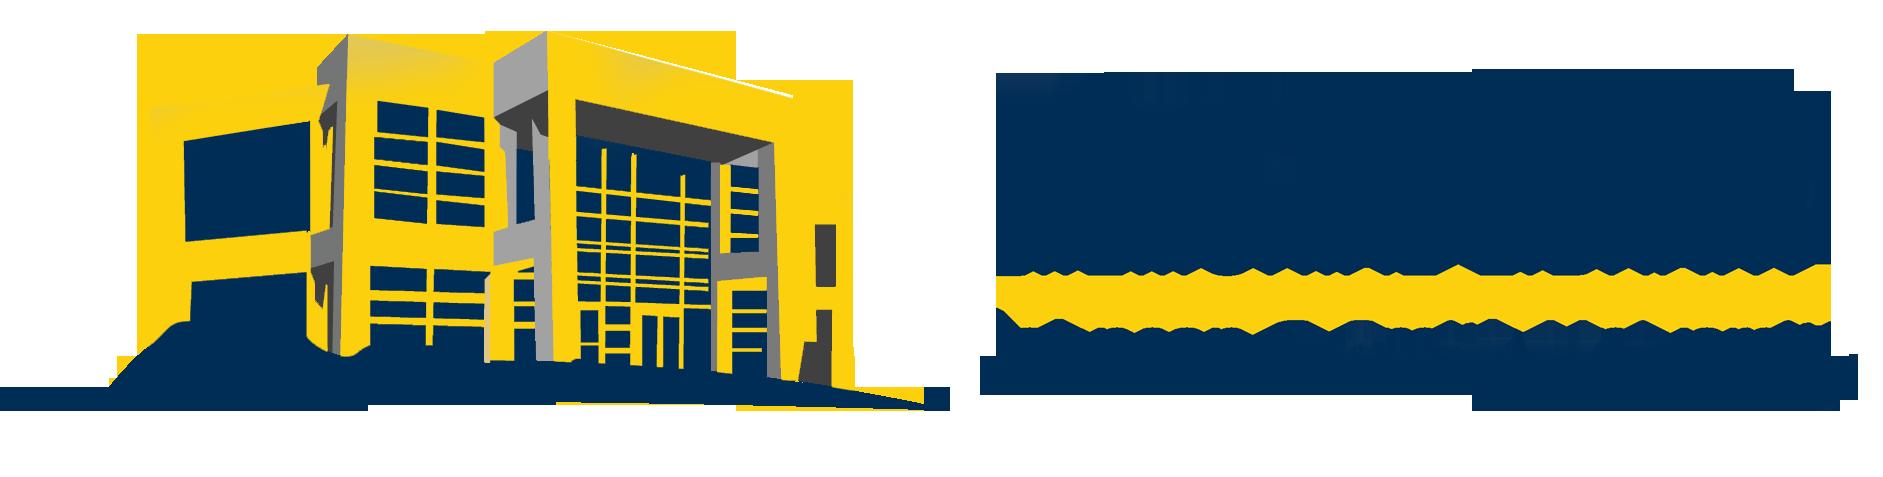 JCSU_library_final-long.png